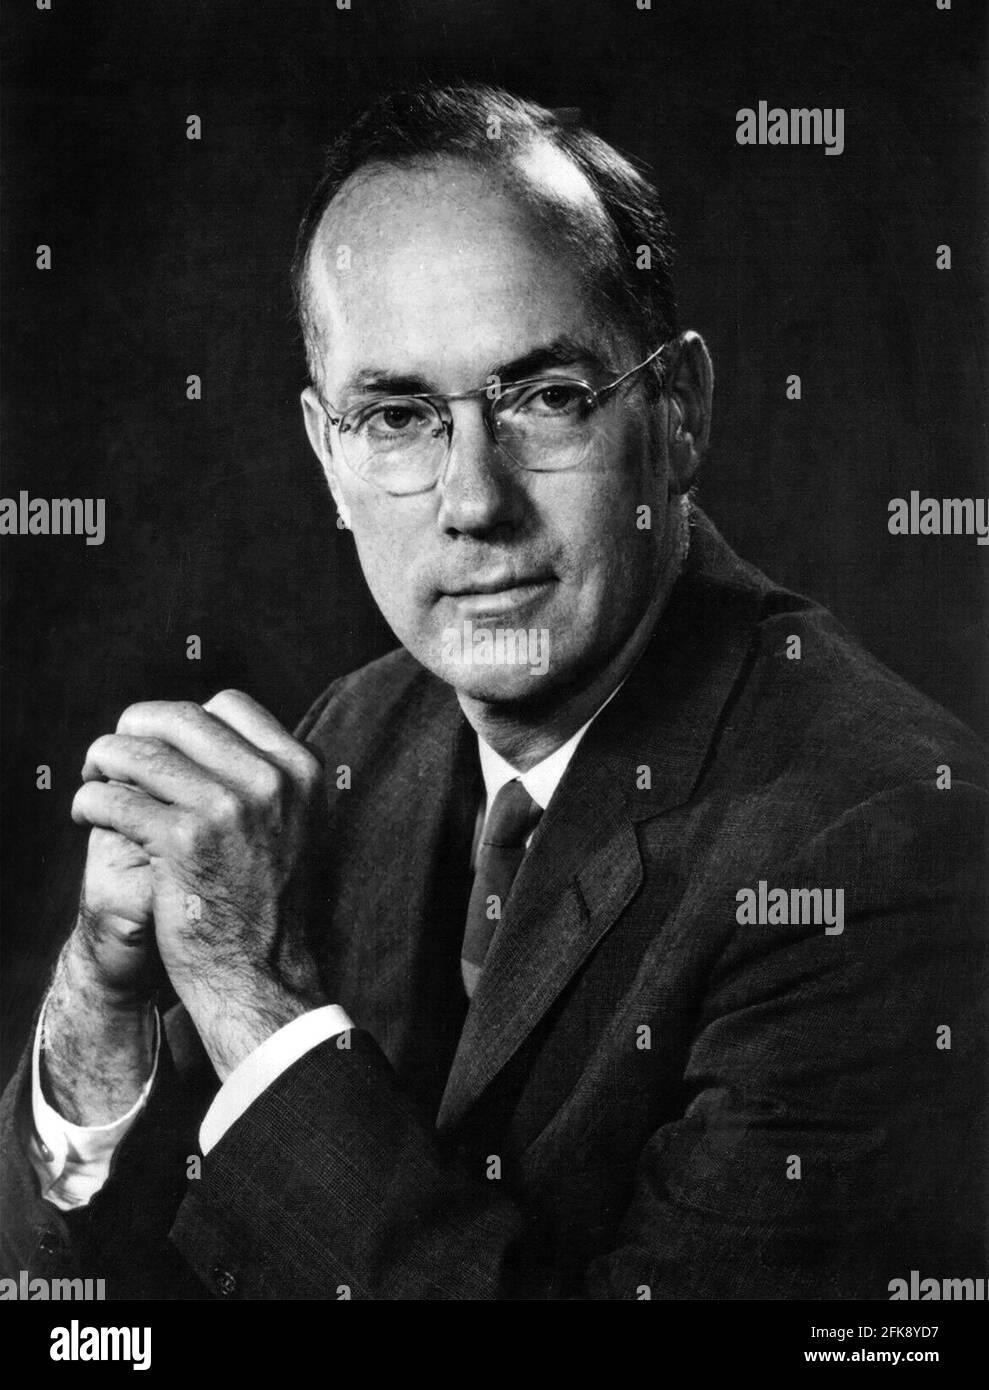 Charles Townes. Ritratto del fisico americano Charles Hard Townes (1915-2015) Foto Stock